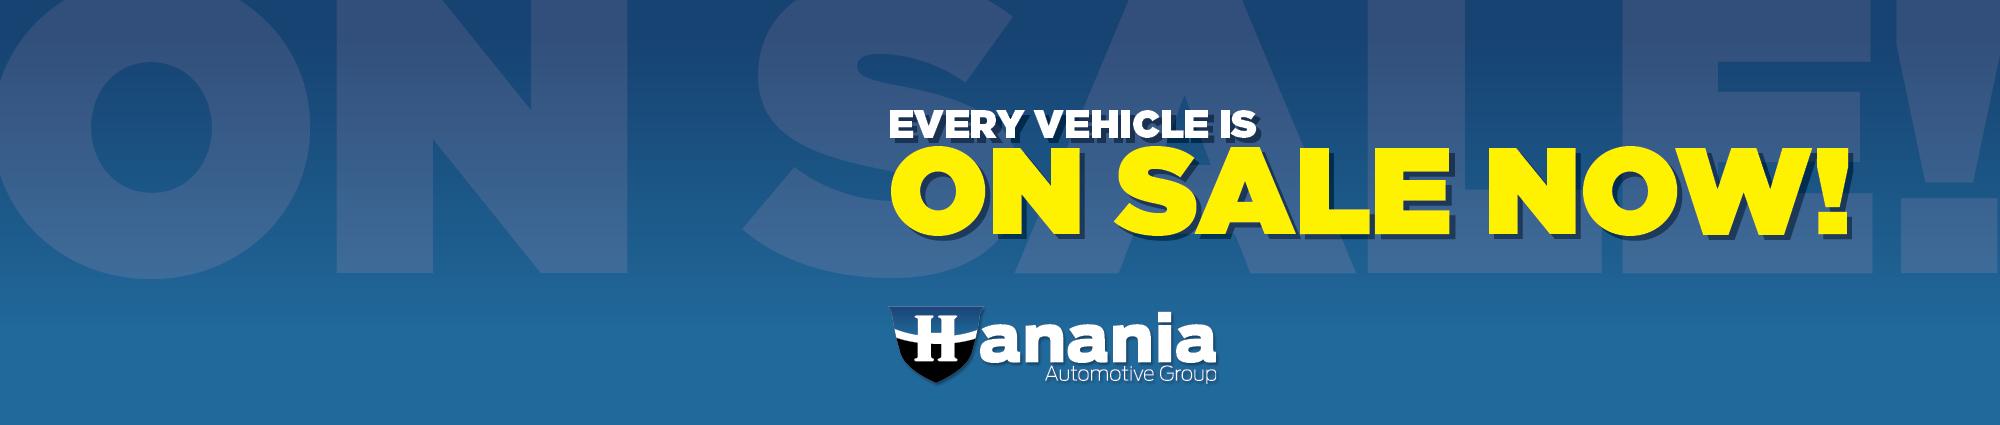 Hanania Automotive Group Hanania Automotive Group